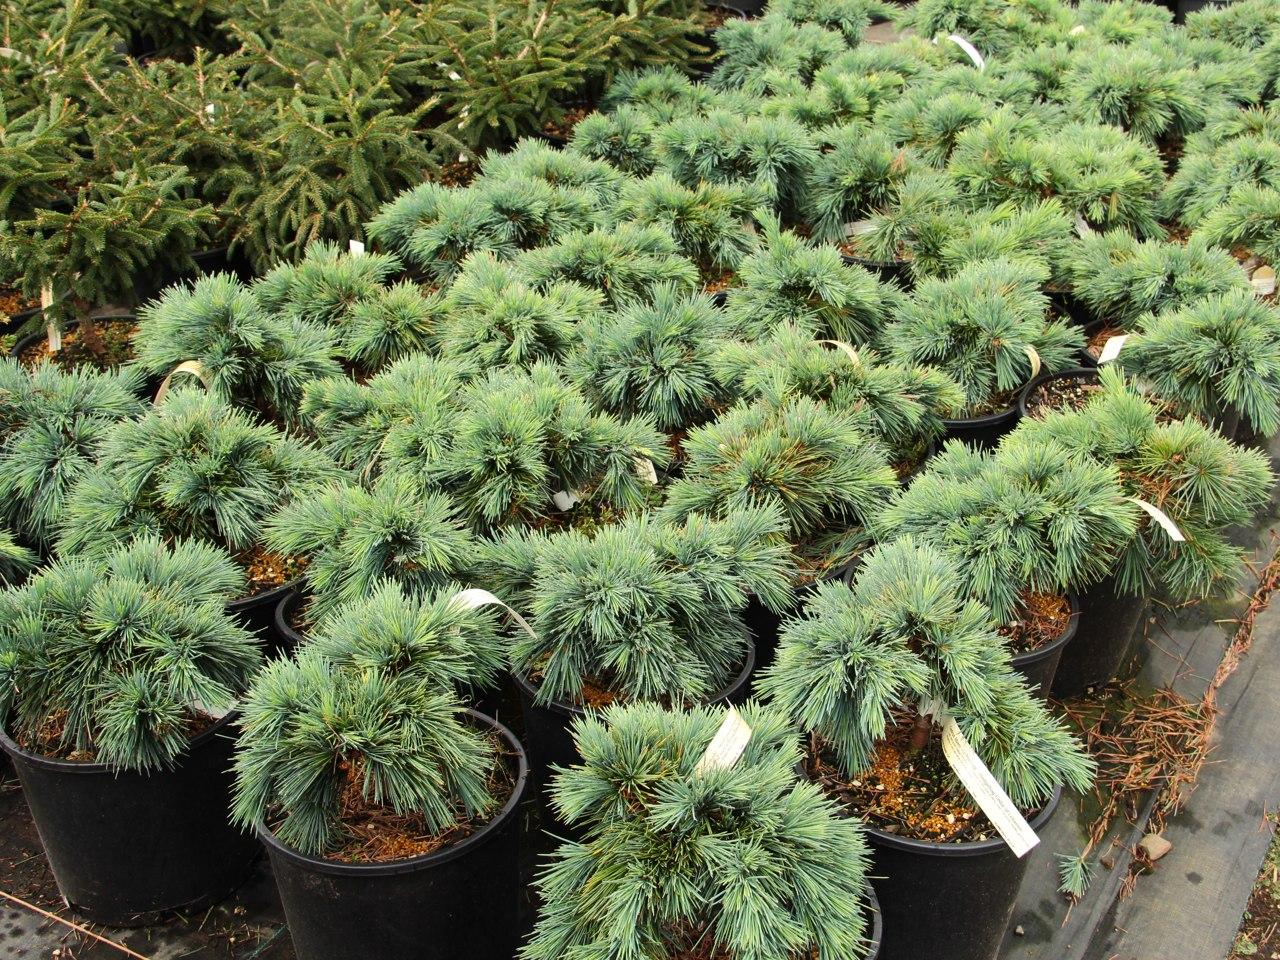 Cedrus libani Hedgehog Cedar of Lebanon evergreen conifer blue green needles miniature mounded